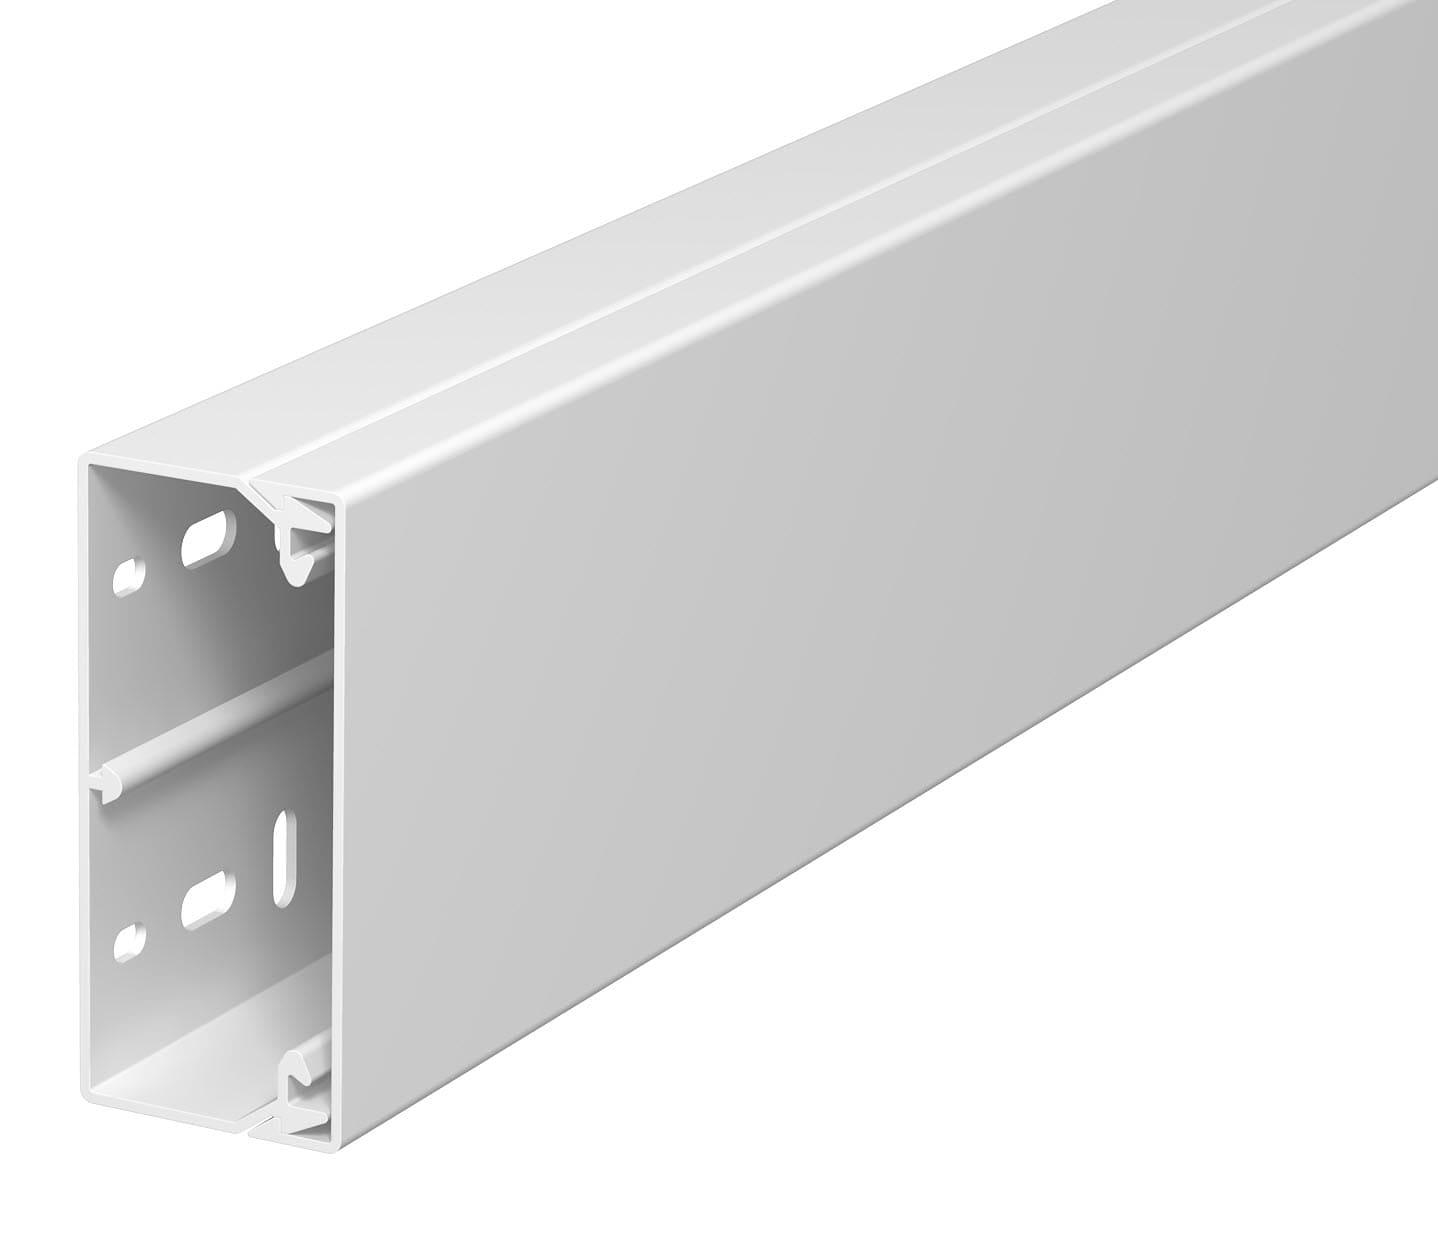 OBO Bettermann 40x90 WDK40090RW Wand+Deckenkanal mit Bodenlochung 40x90mm 2 Meter PVC reinweiss